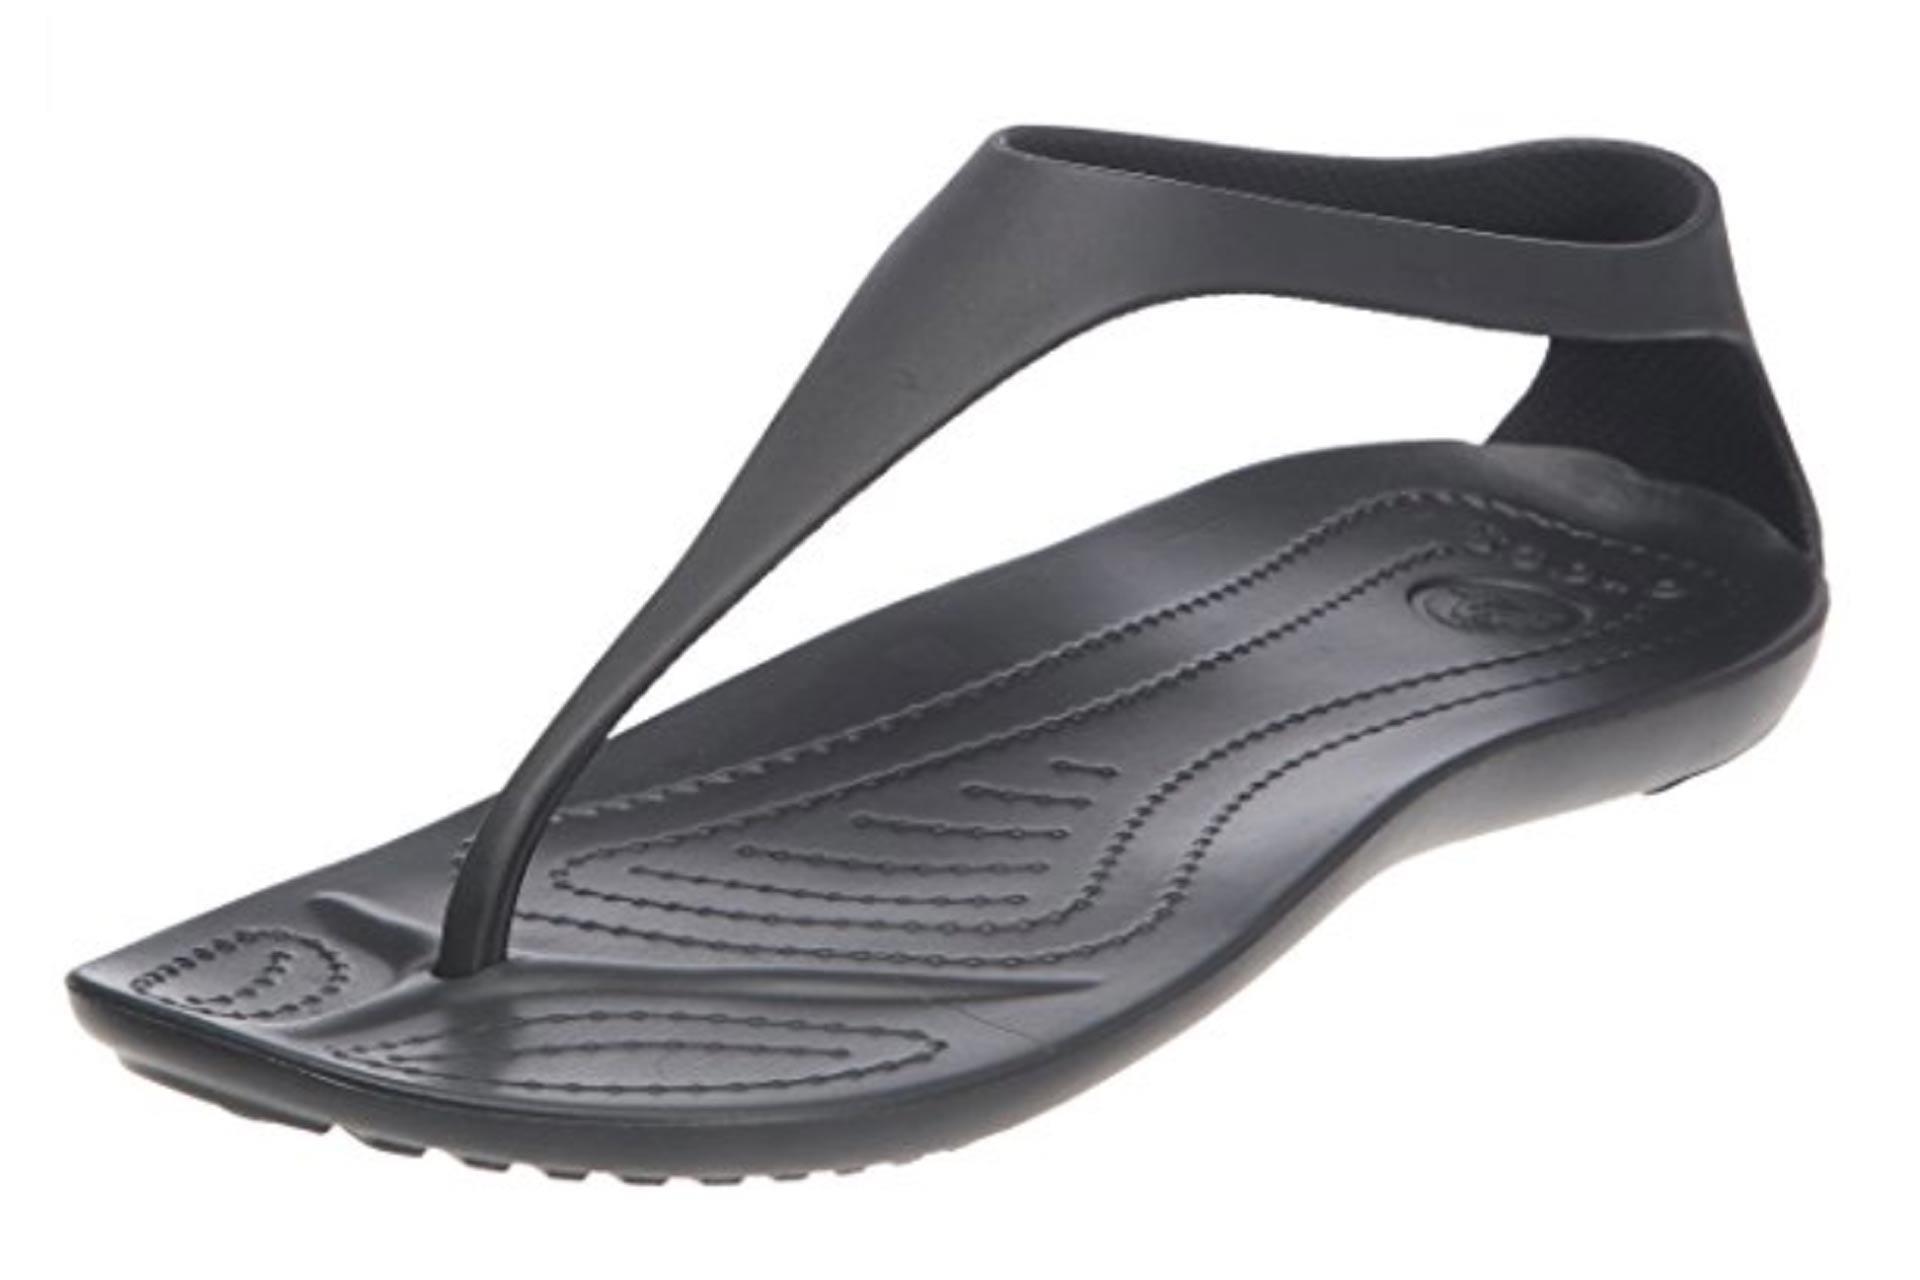 Crocs Women's Sexi Flip Sandal.